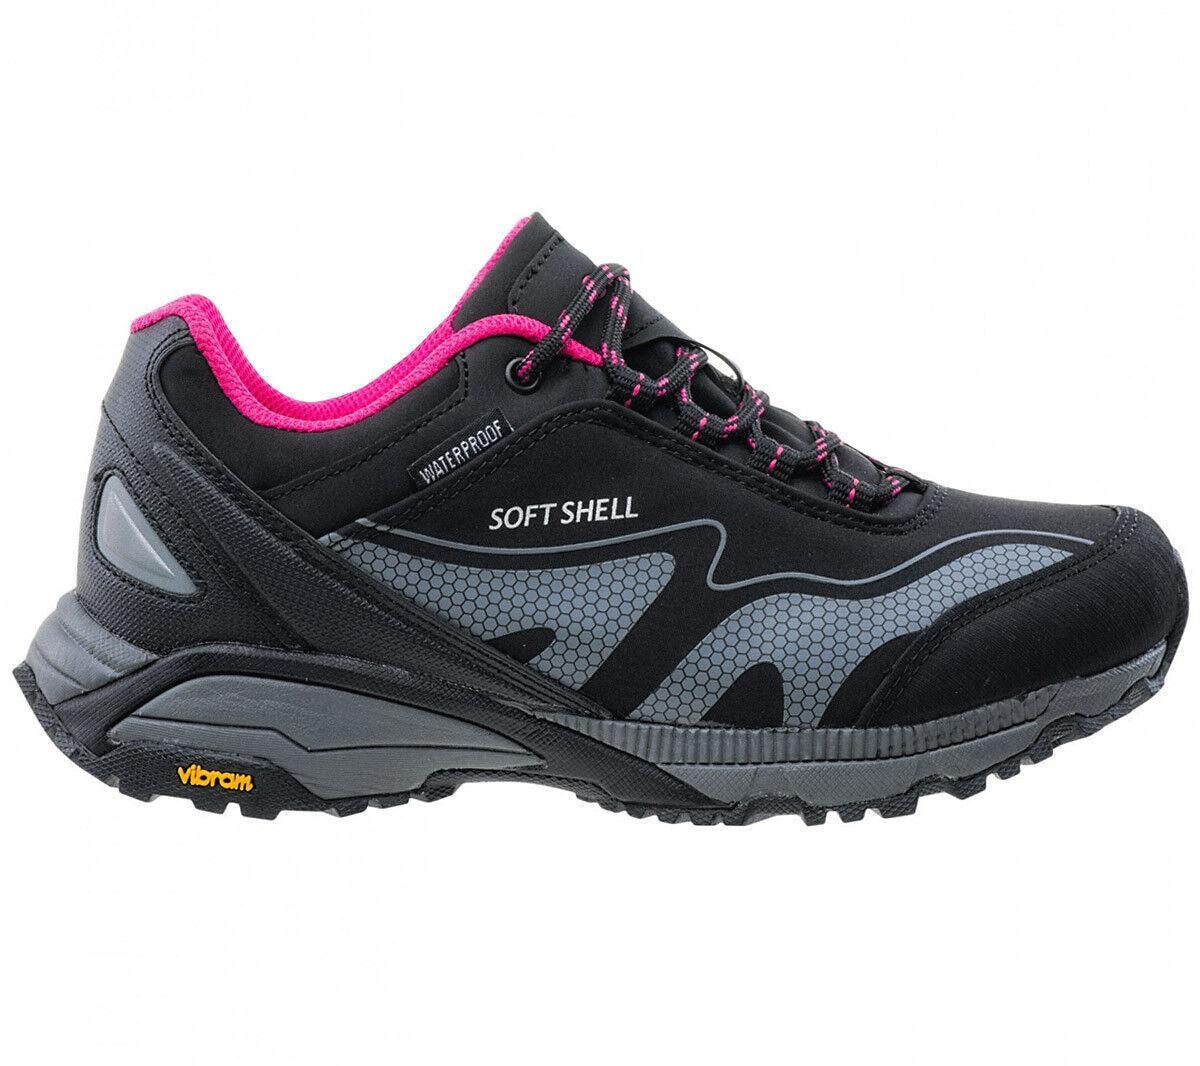 Hi-Tec kangri Low Vibram WP Softshell Vibram Low  Zapatos  zapatillas de senderismo de mujer 75e382